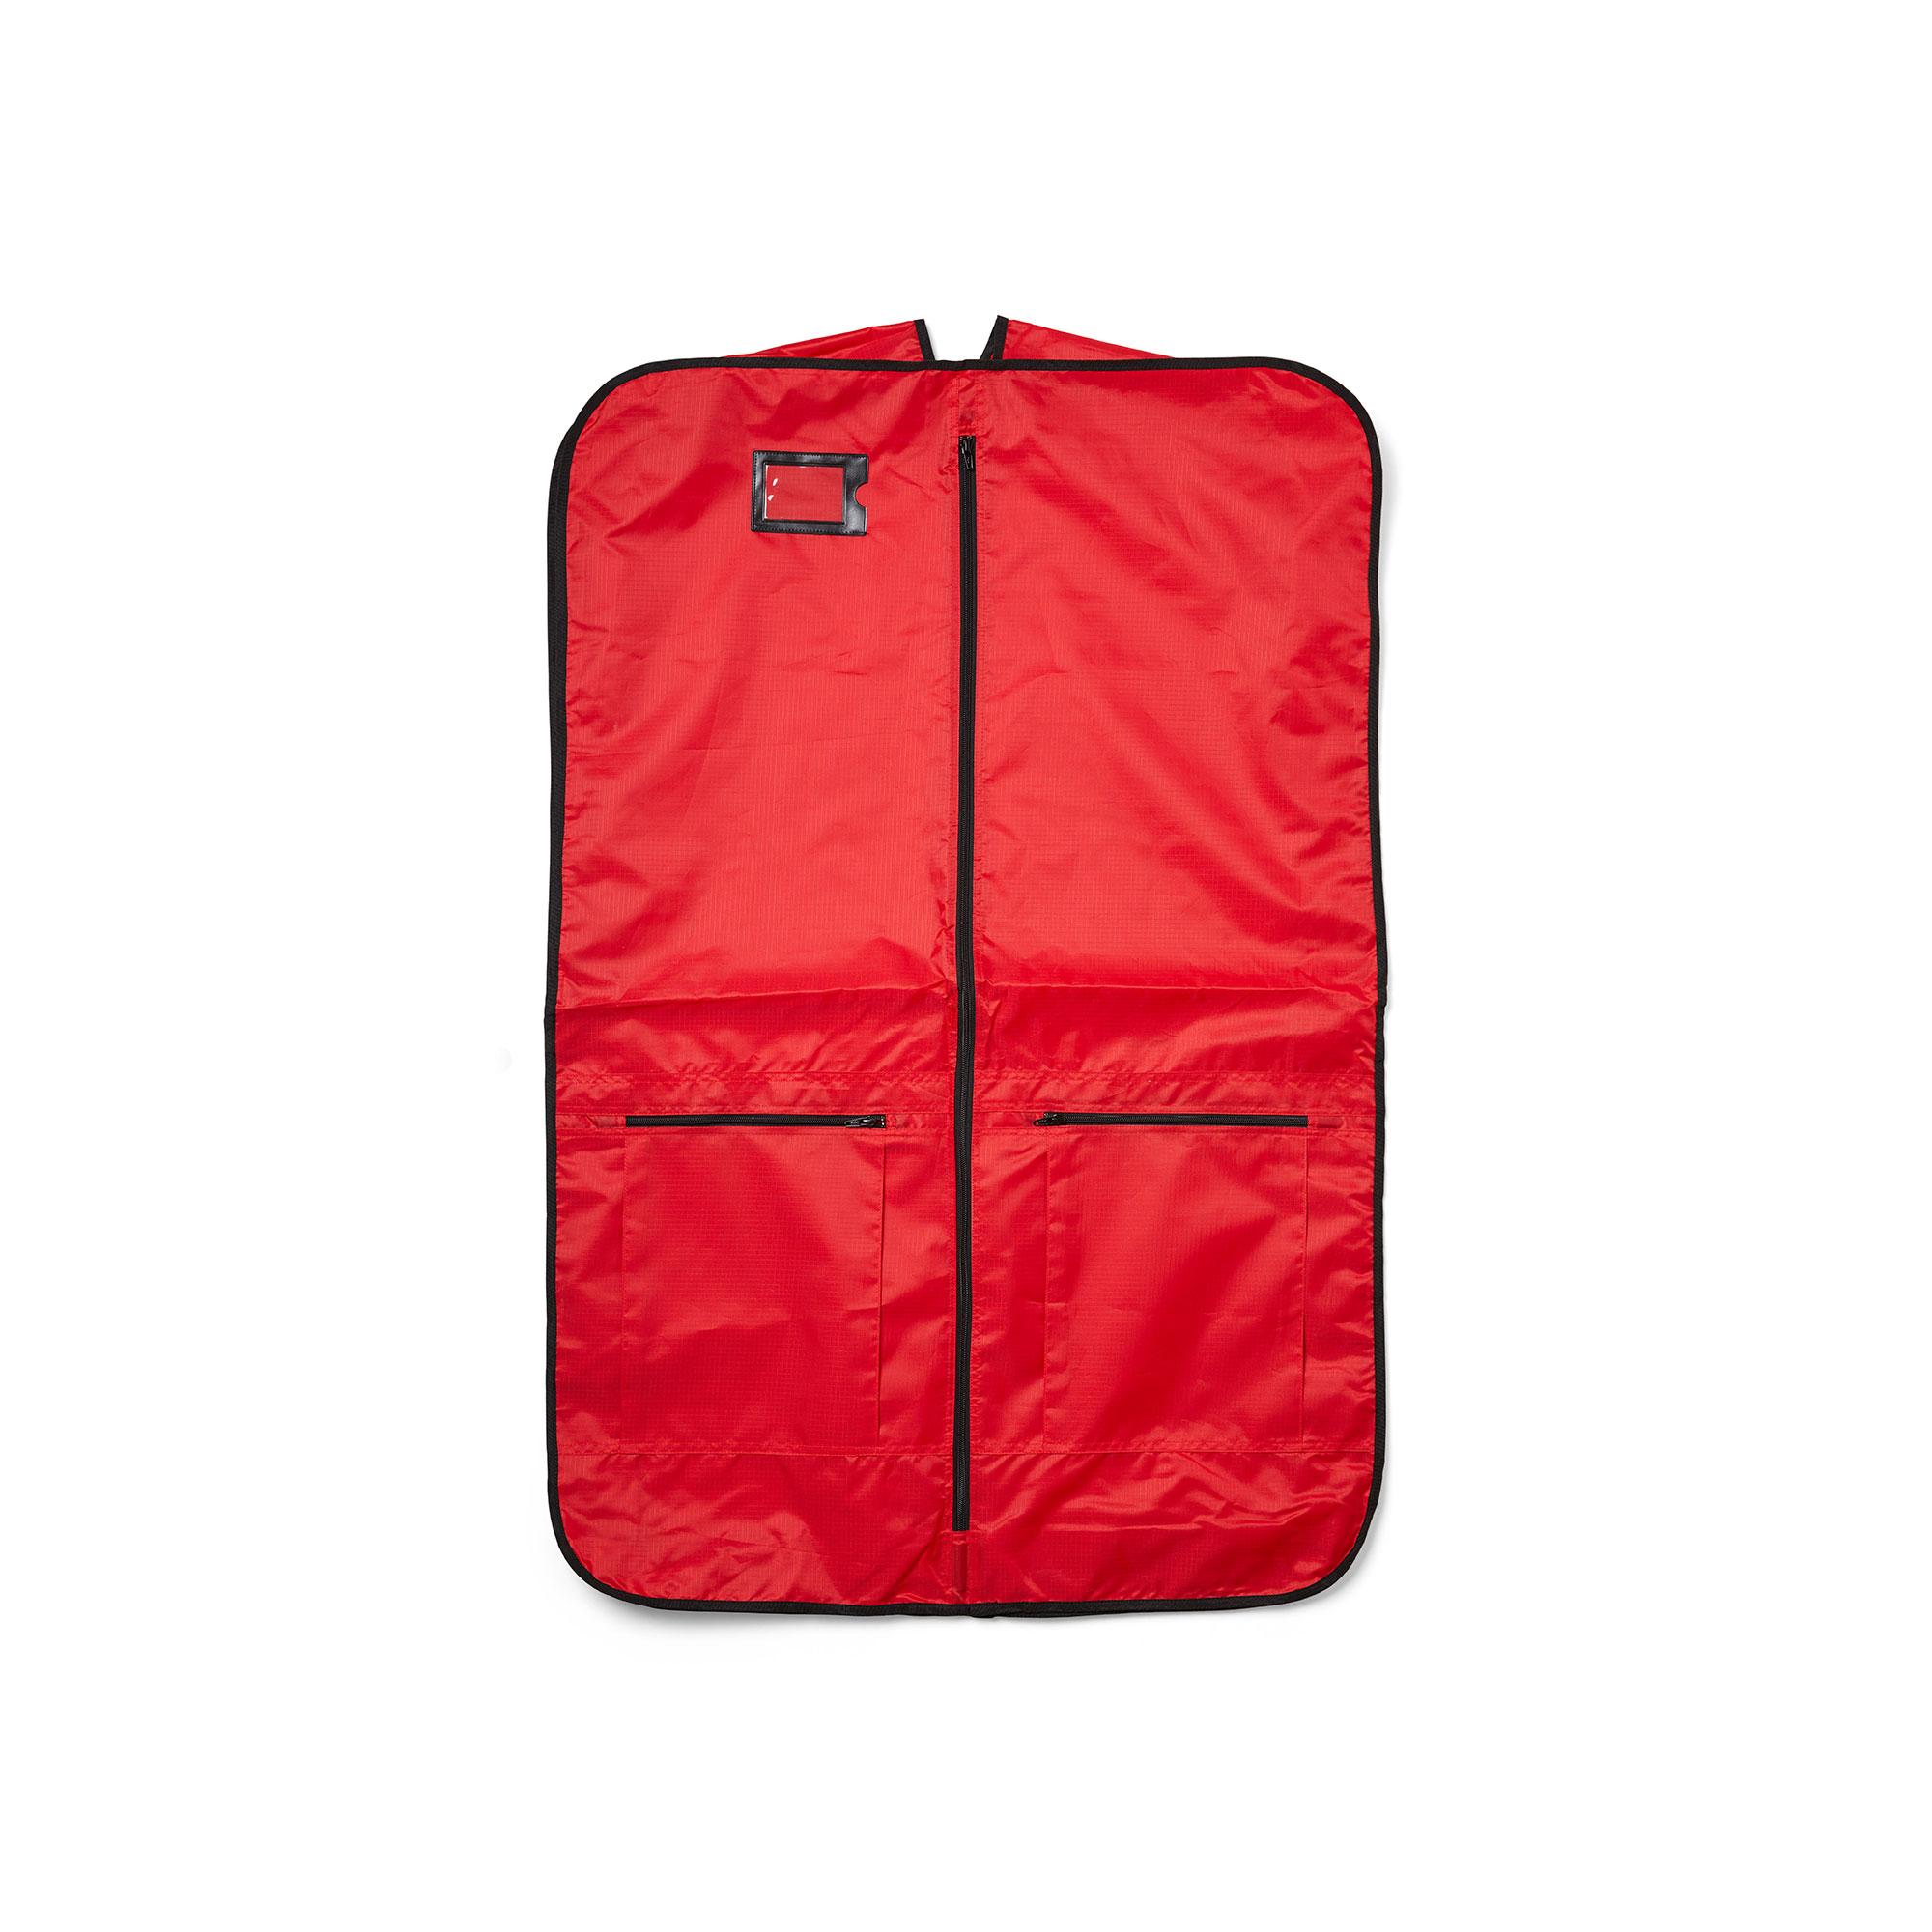 Garment-Bag-2